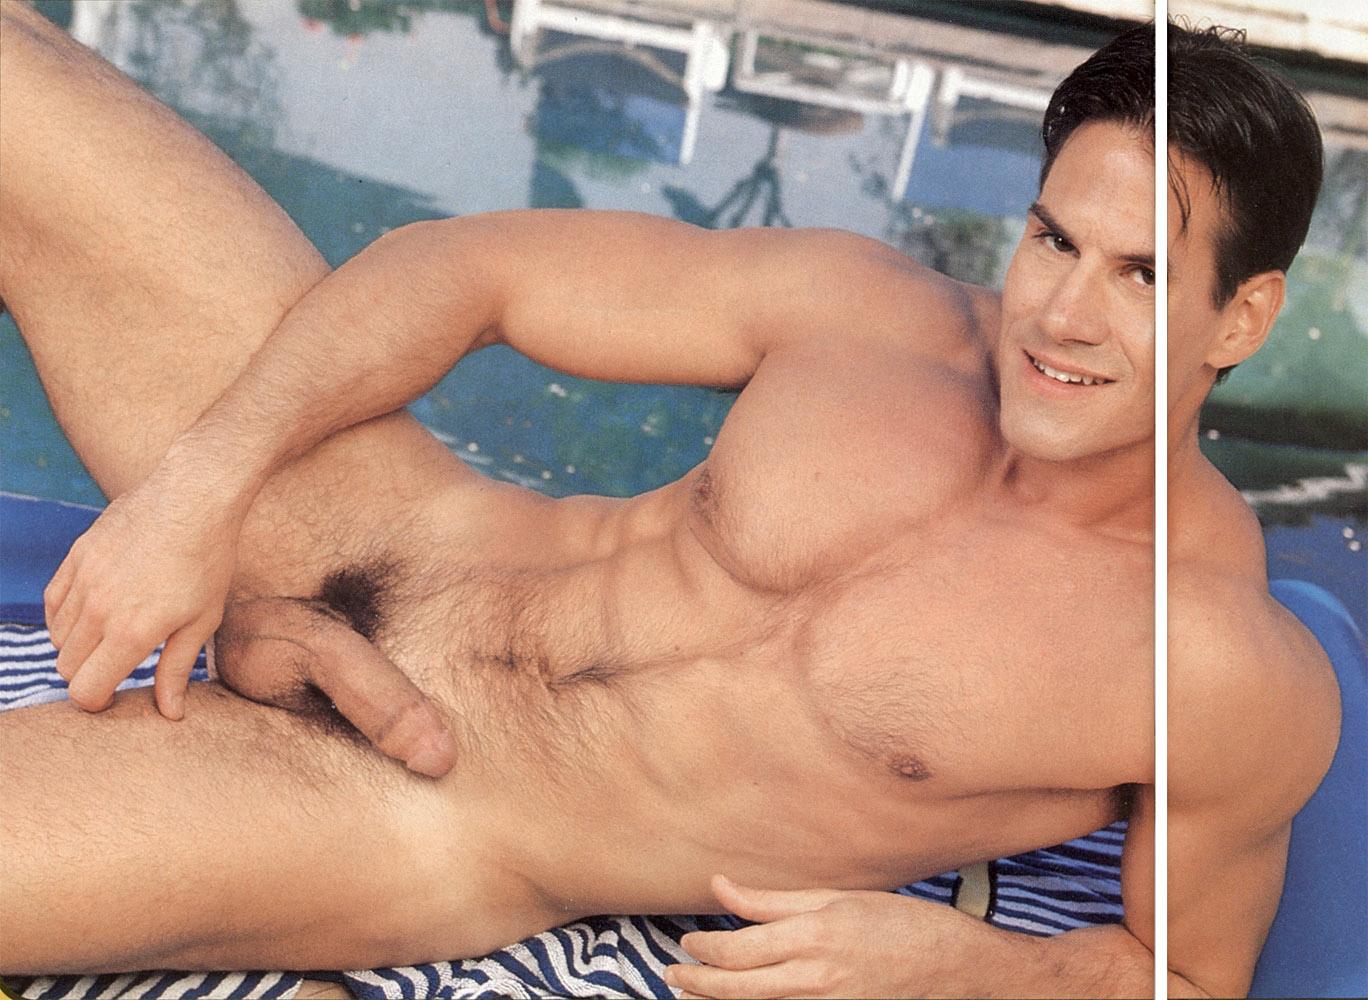 Rick Donovan Porn Star Minimalist brutos-eros: tony piagi